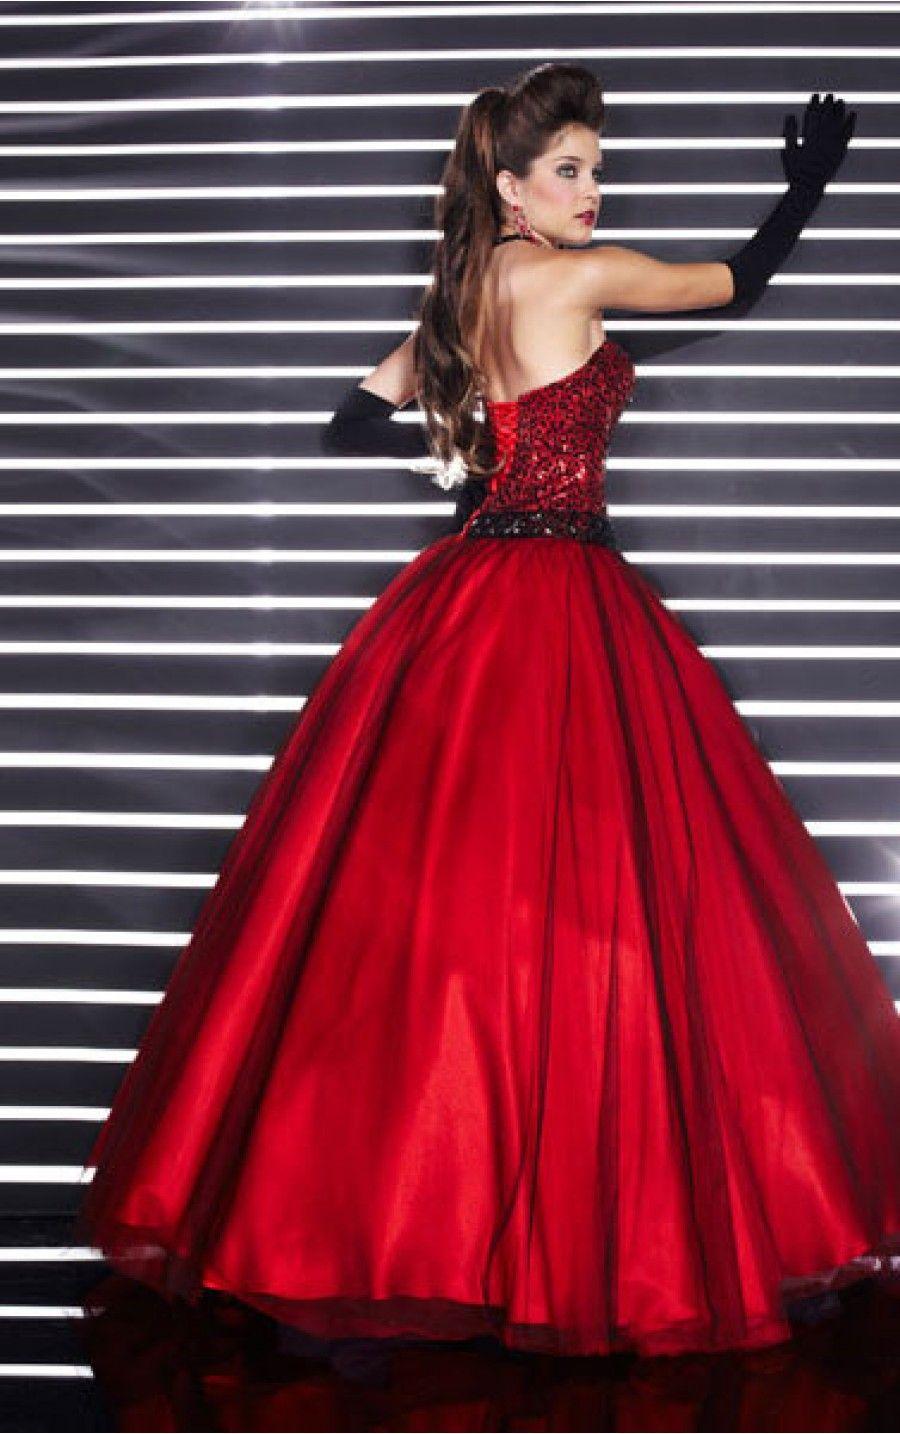 17 Best images about USMC Ball 2k14 dress ideas on Pinterest ...